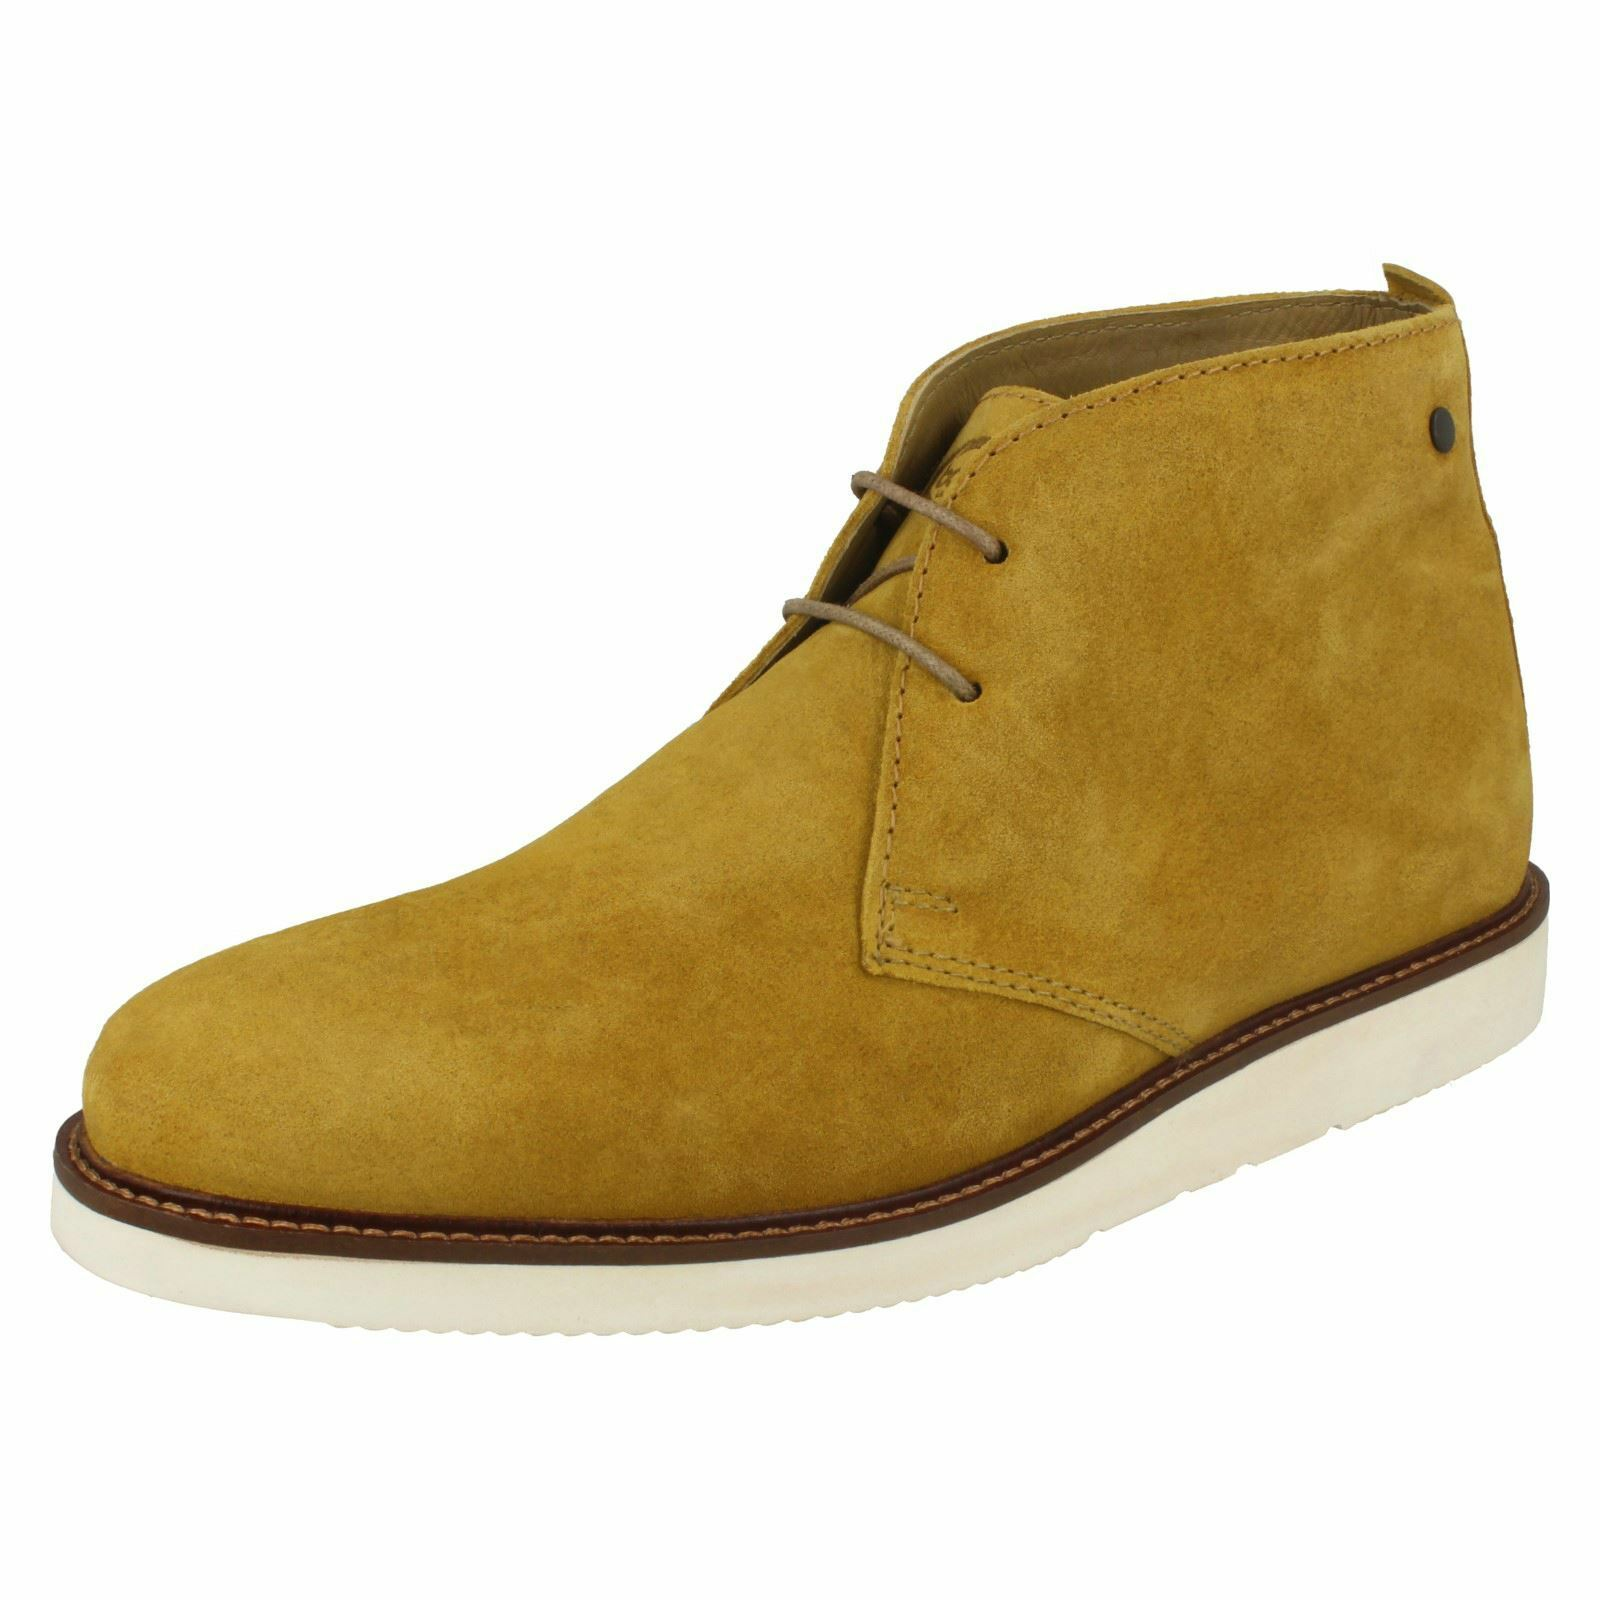 Base London 'Cobden Men's Suede Mustard Chukka Boots